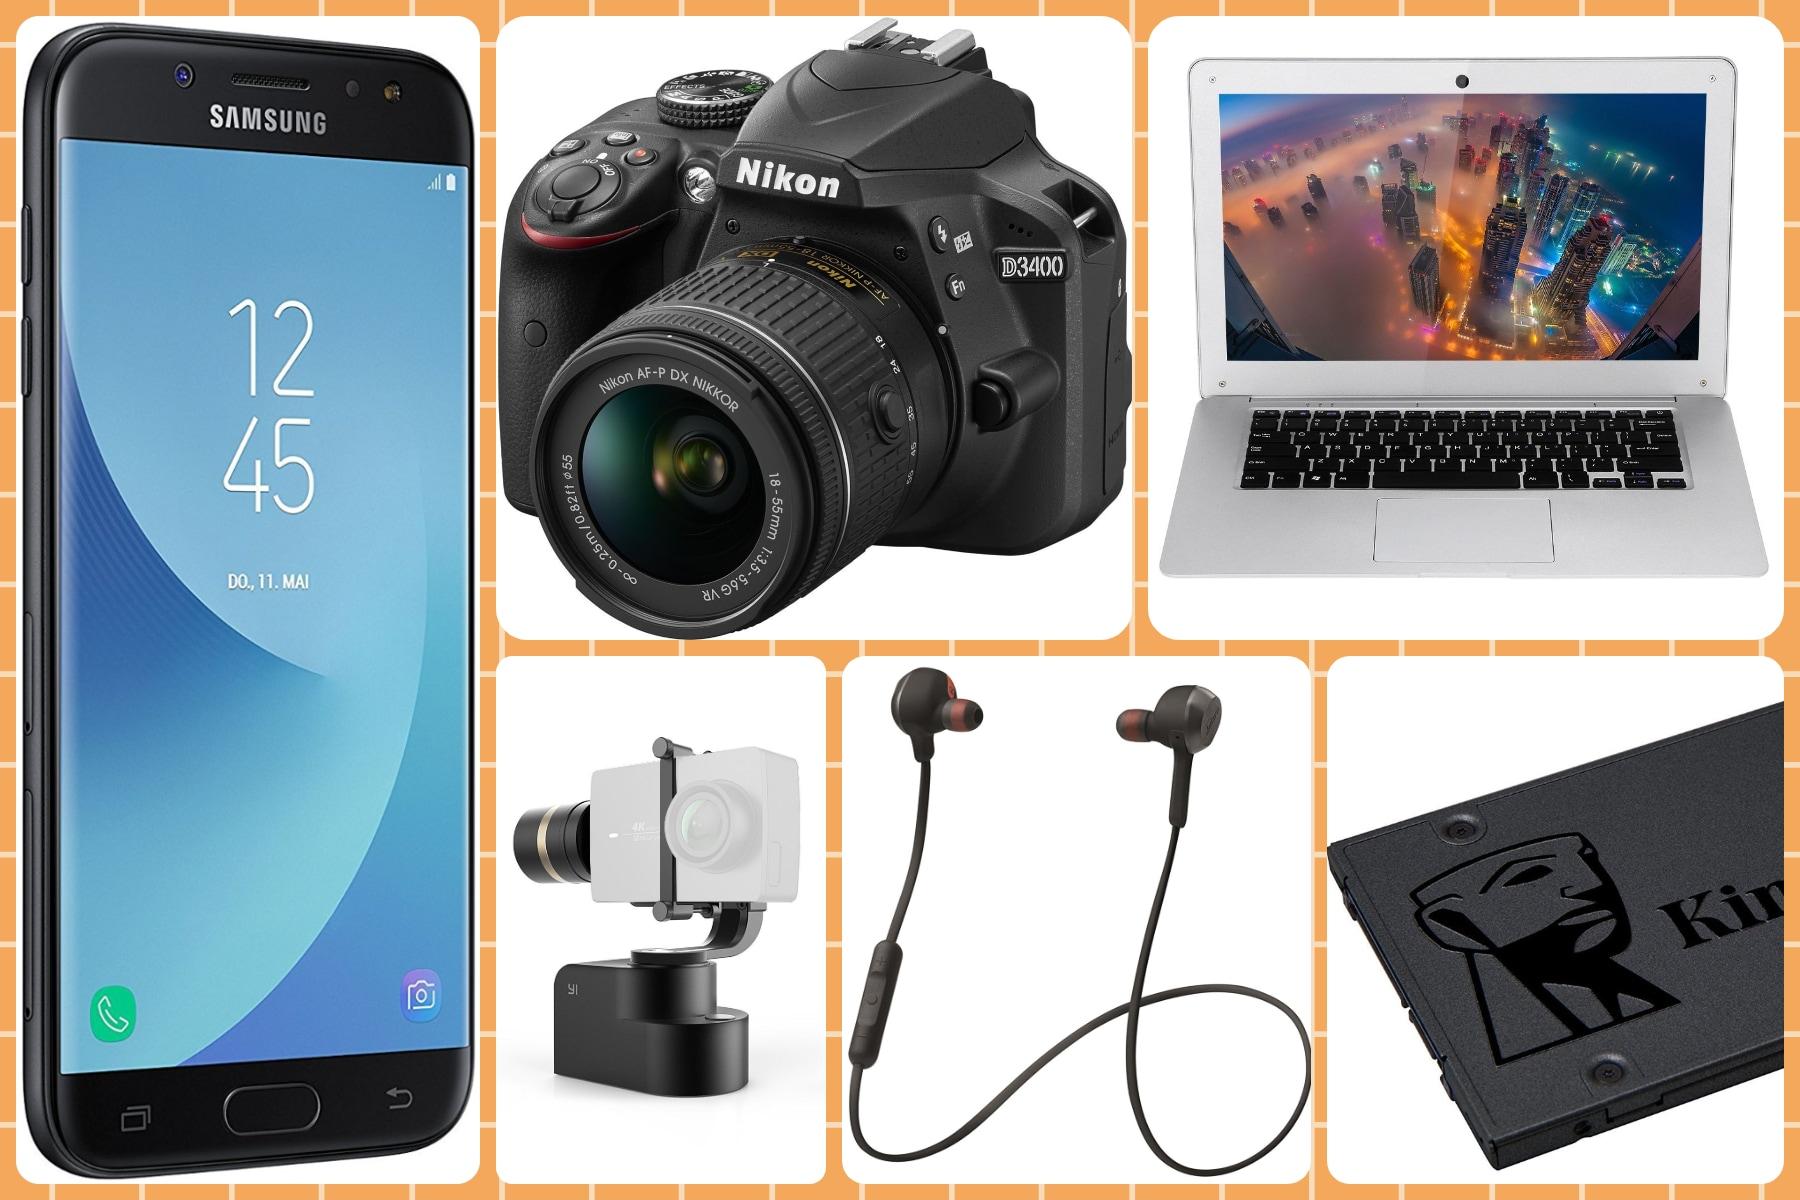 Offerte Amazon: notebook lowcost, reflex Nikon, SSD e smartphone ...